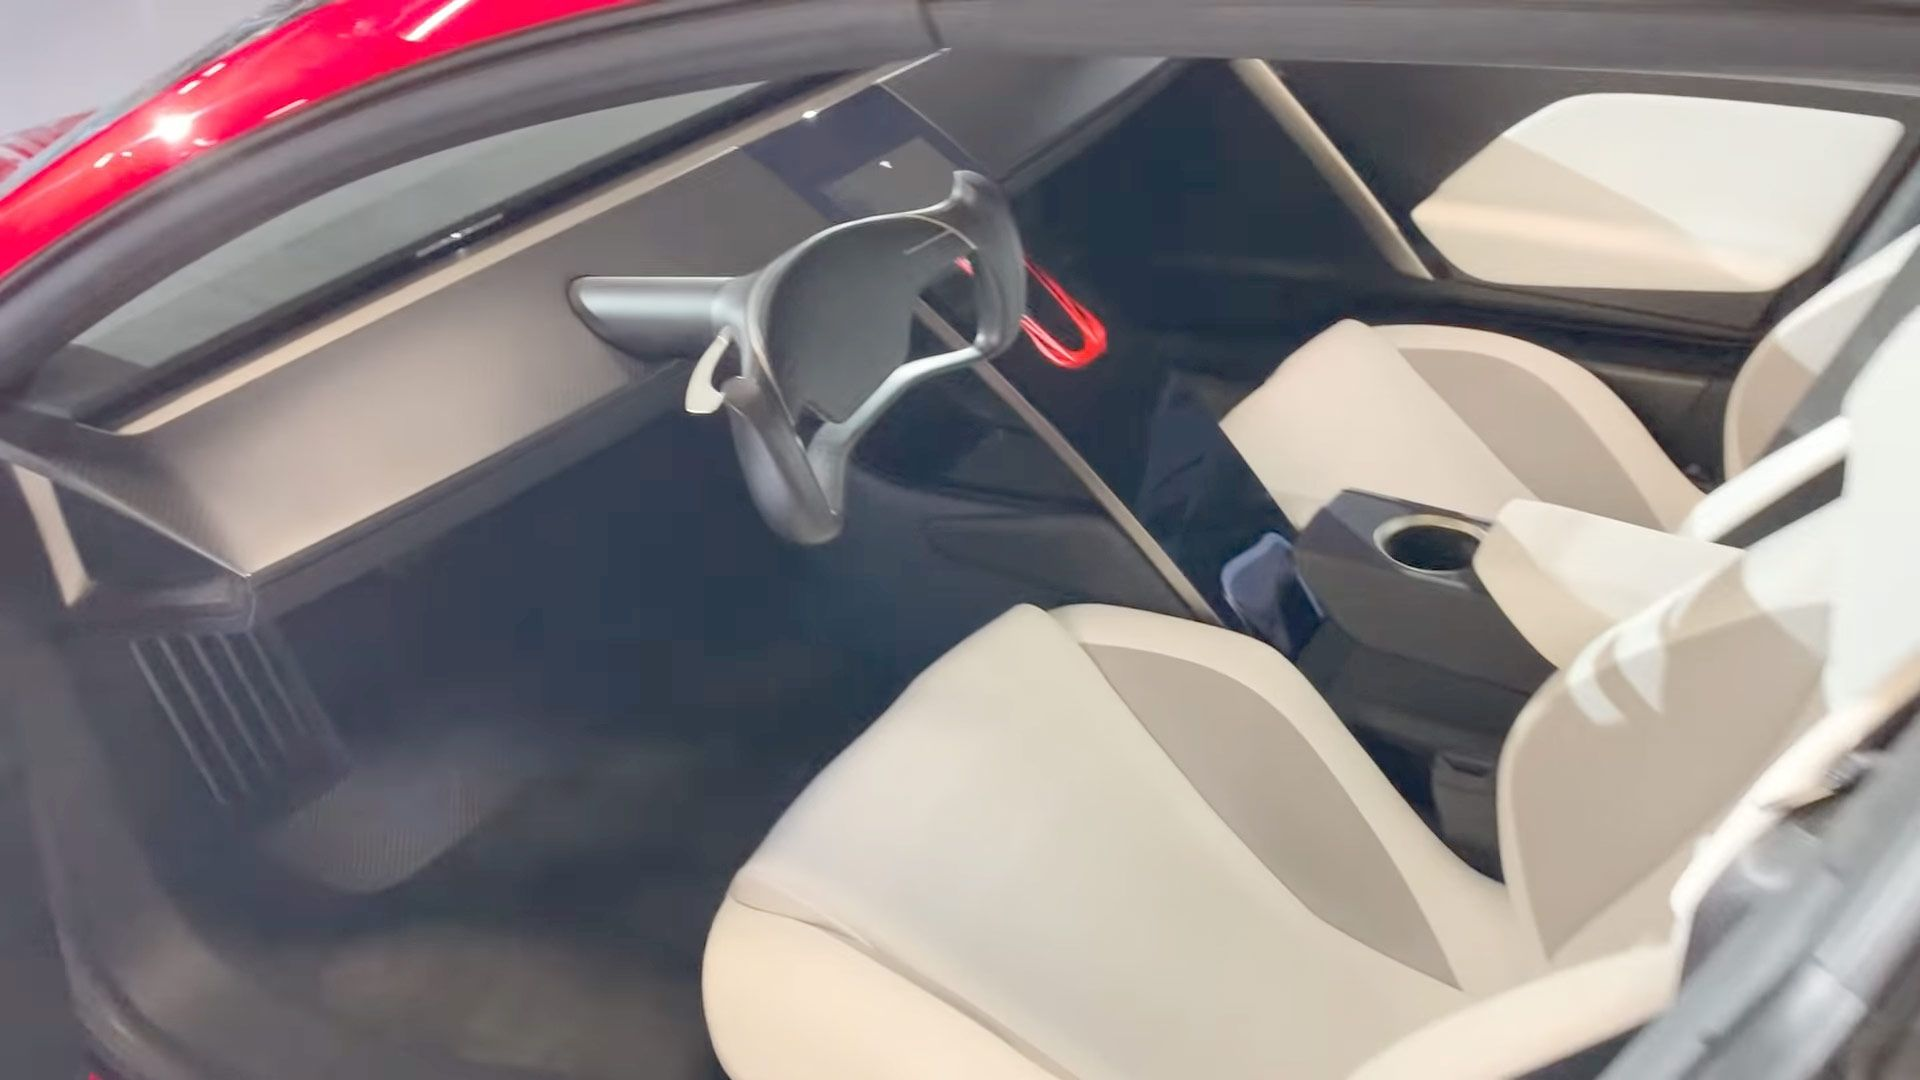 Latest Tesla Roadster Video Shows Its Unique Entry Feature Rear Seats Tesla Roadster Tesla Roadsters